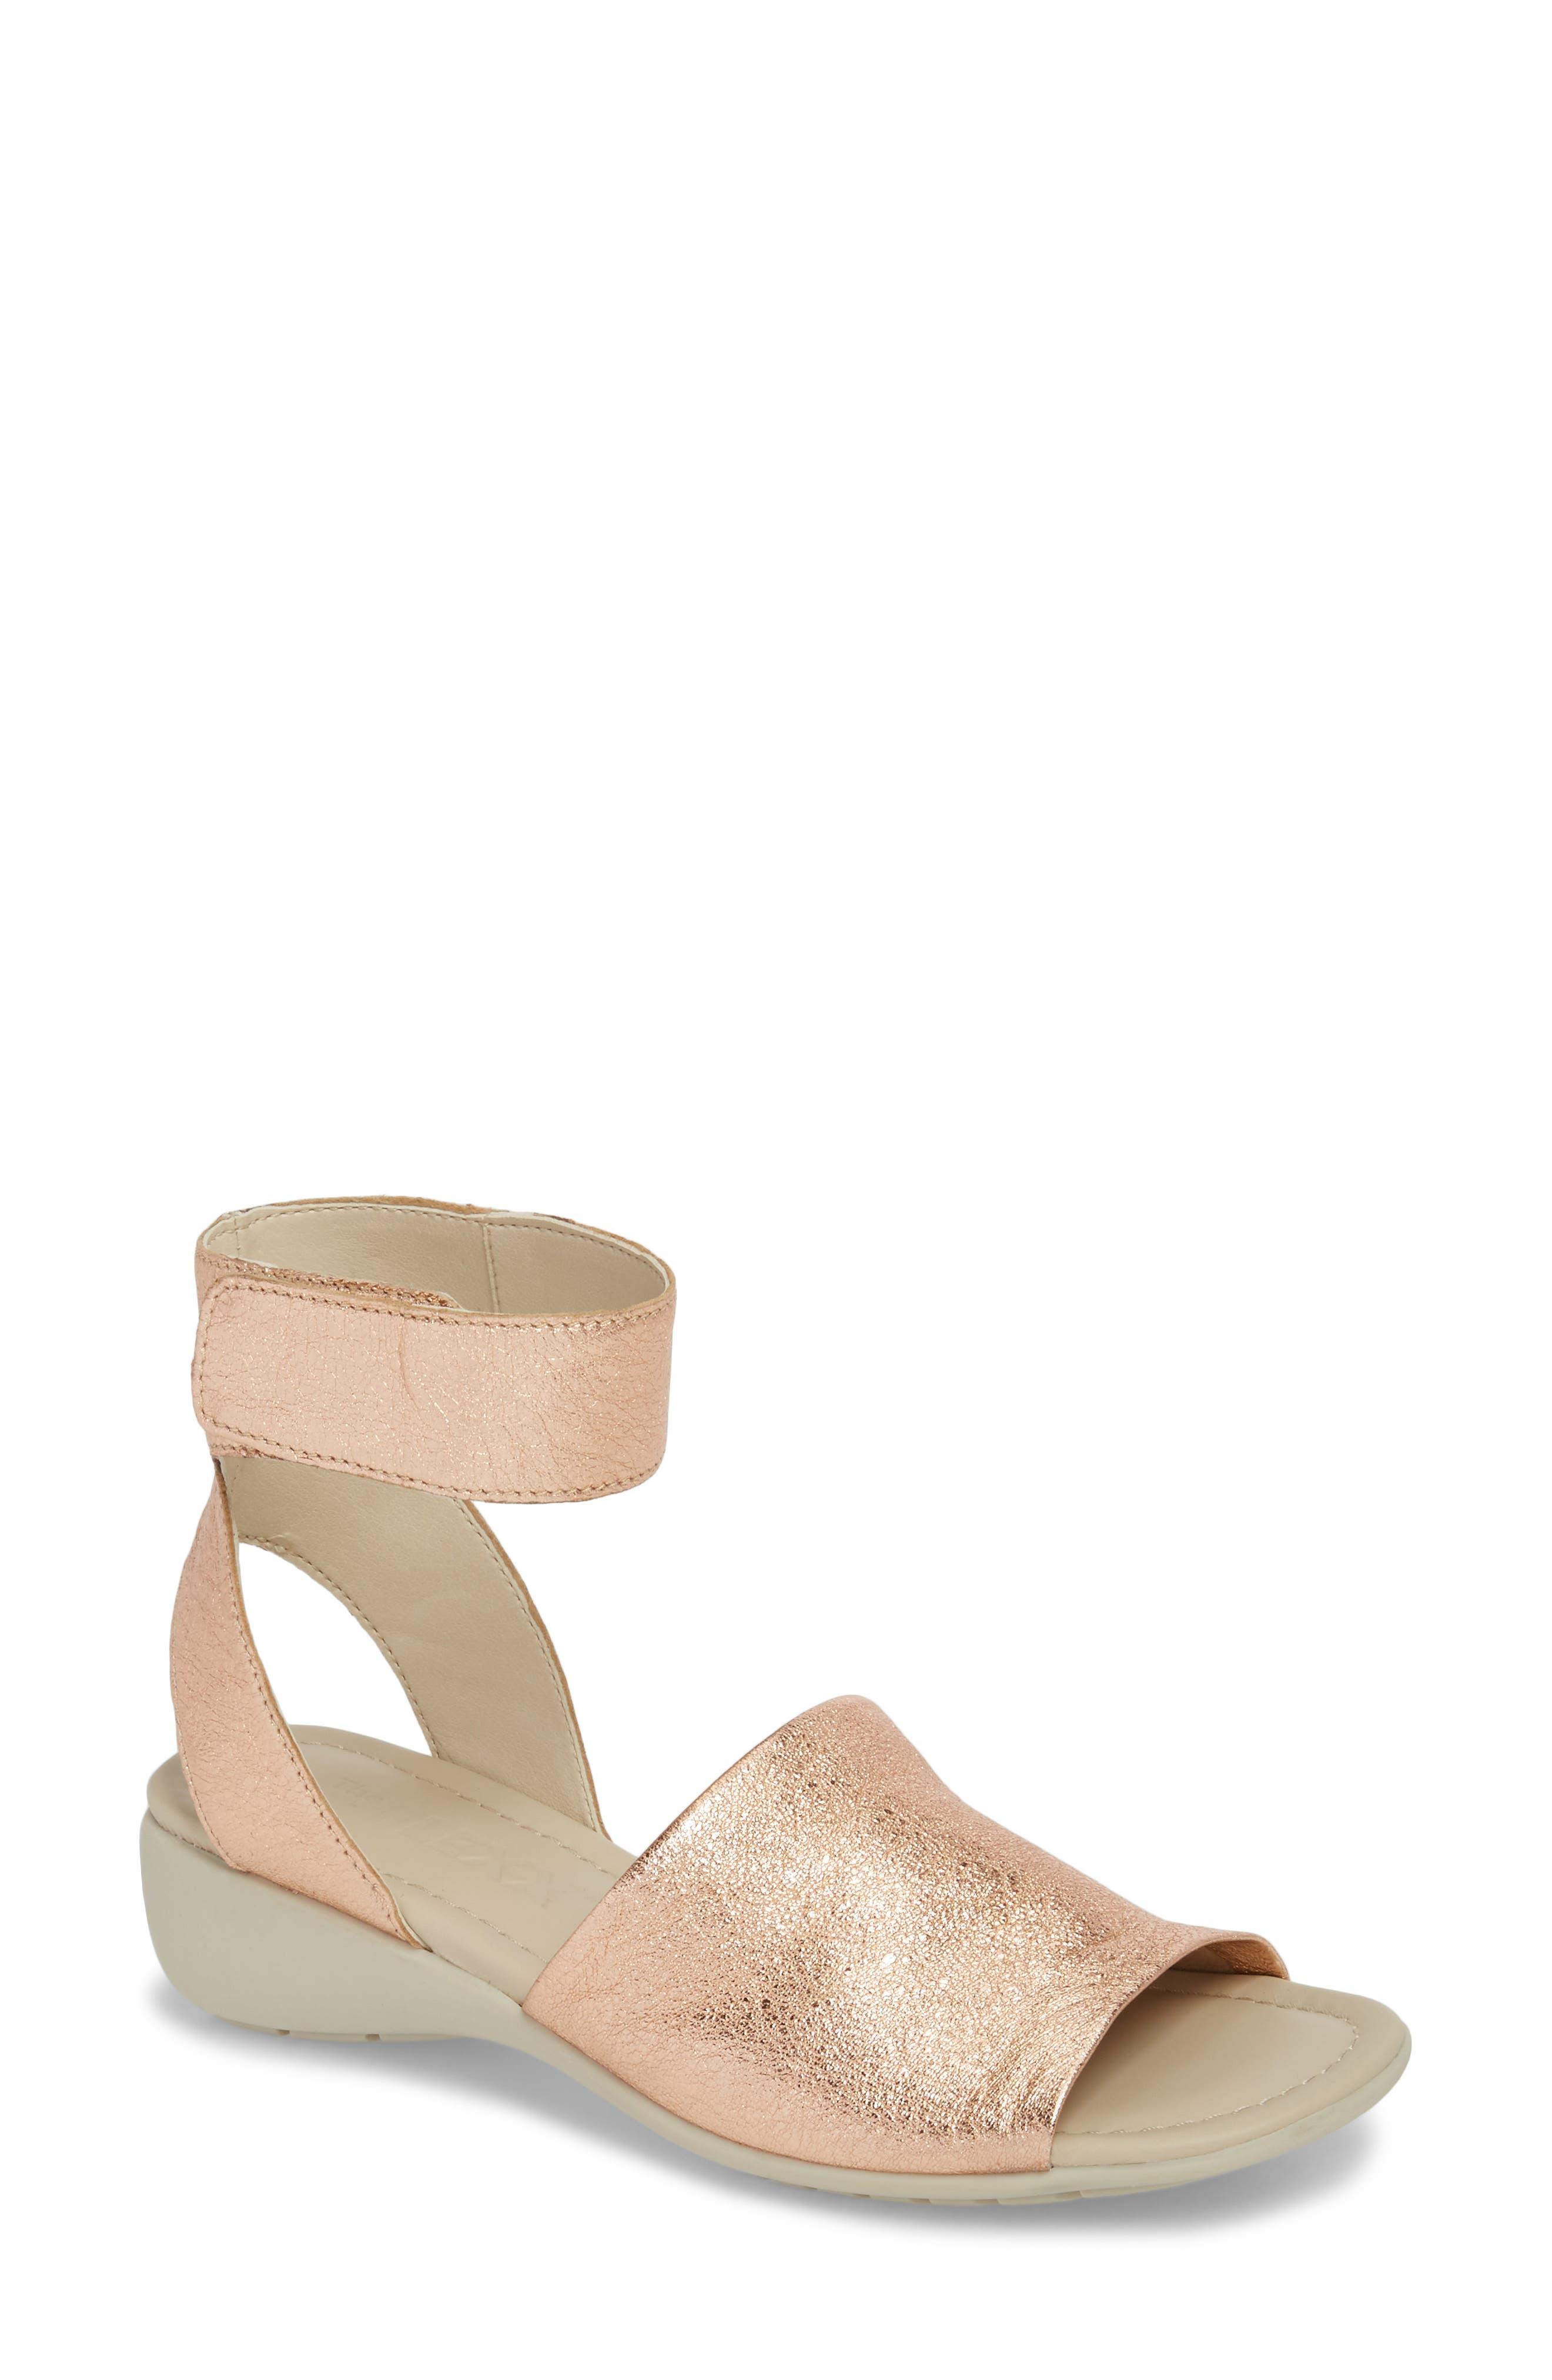 'Beglad' Leather Ankle Strap Sandal,                             Main thumbnail 4, color,